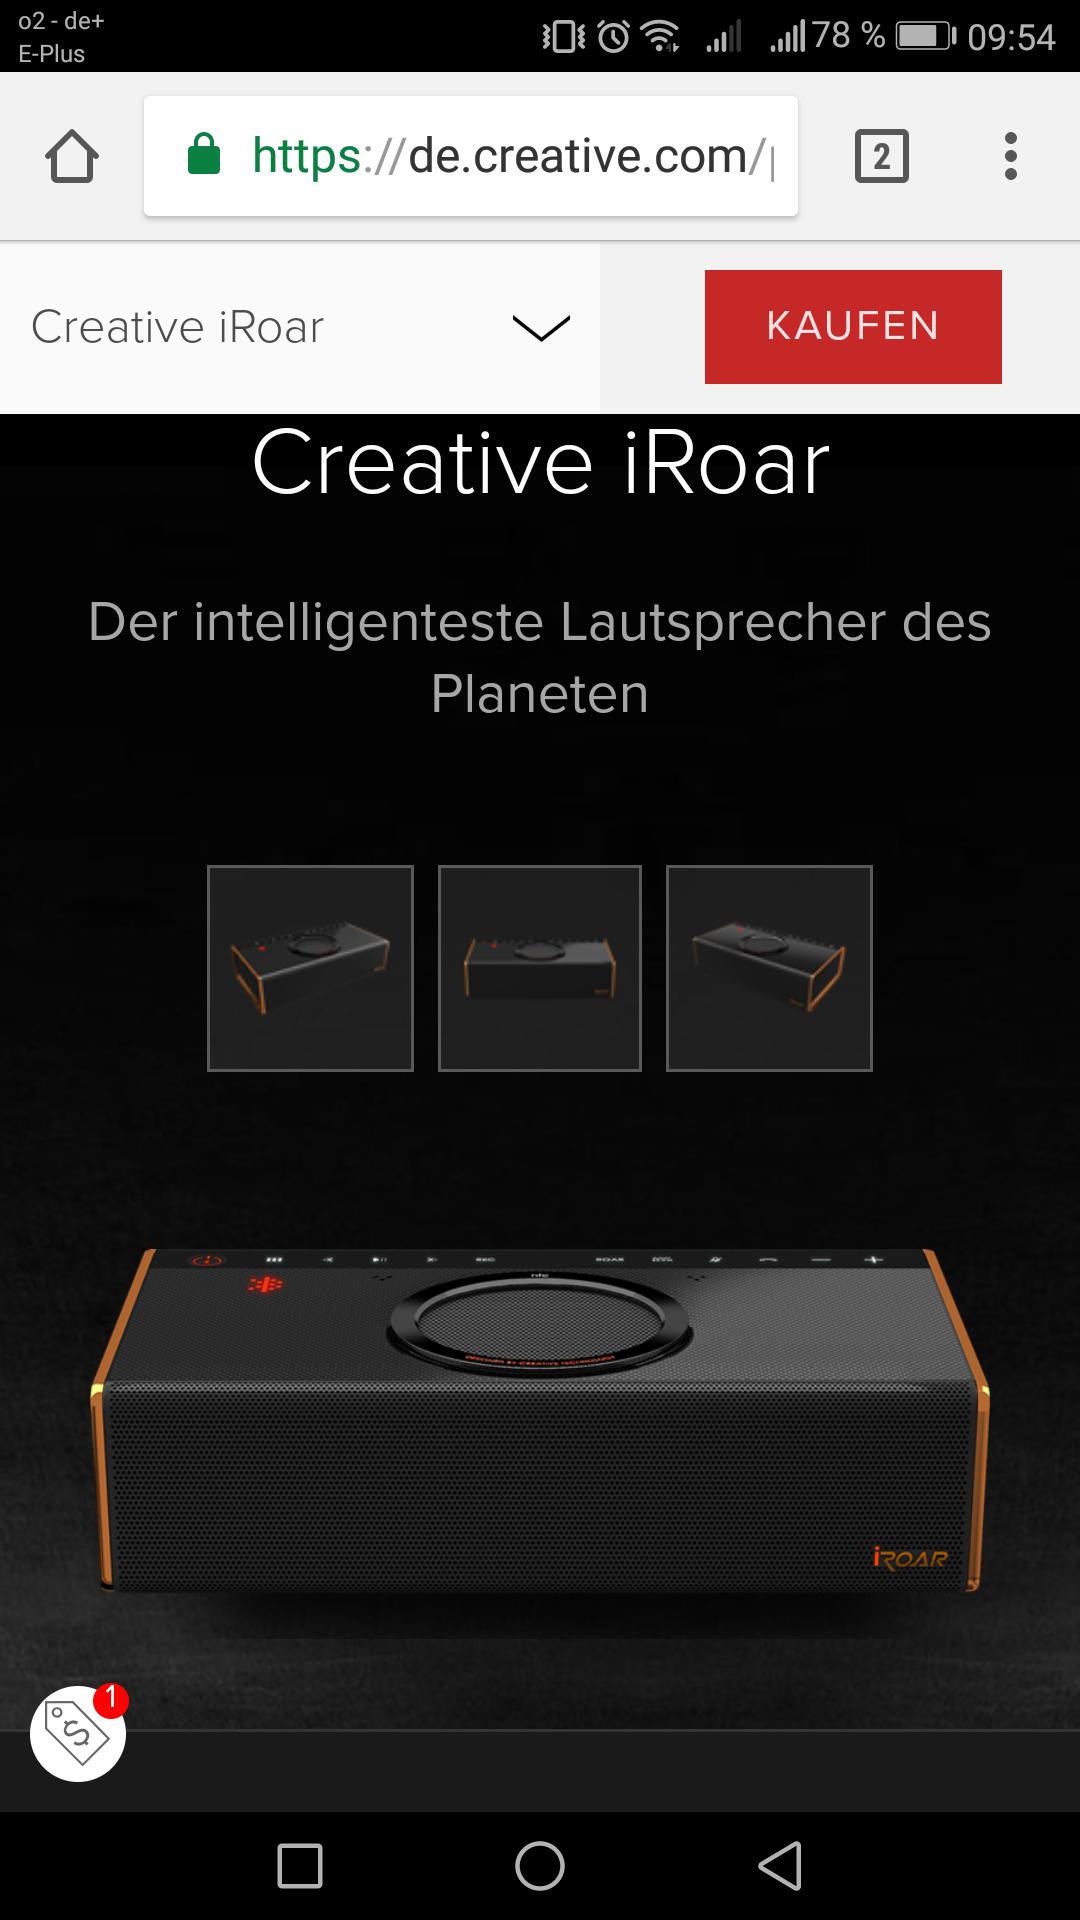 [Creative Online Shop] Creative iRoar Bluetooth Lautsprecher + Creative WP-450Bluetooth Kopfhörer Gratis dazu /Versandkostenfrei